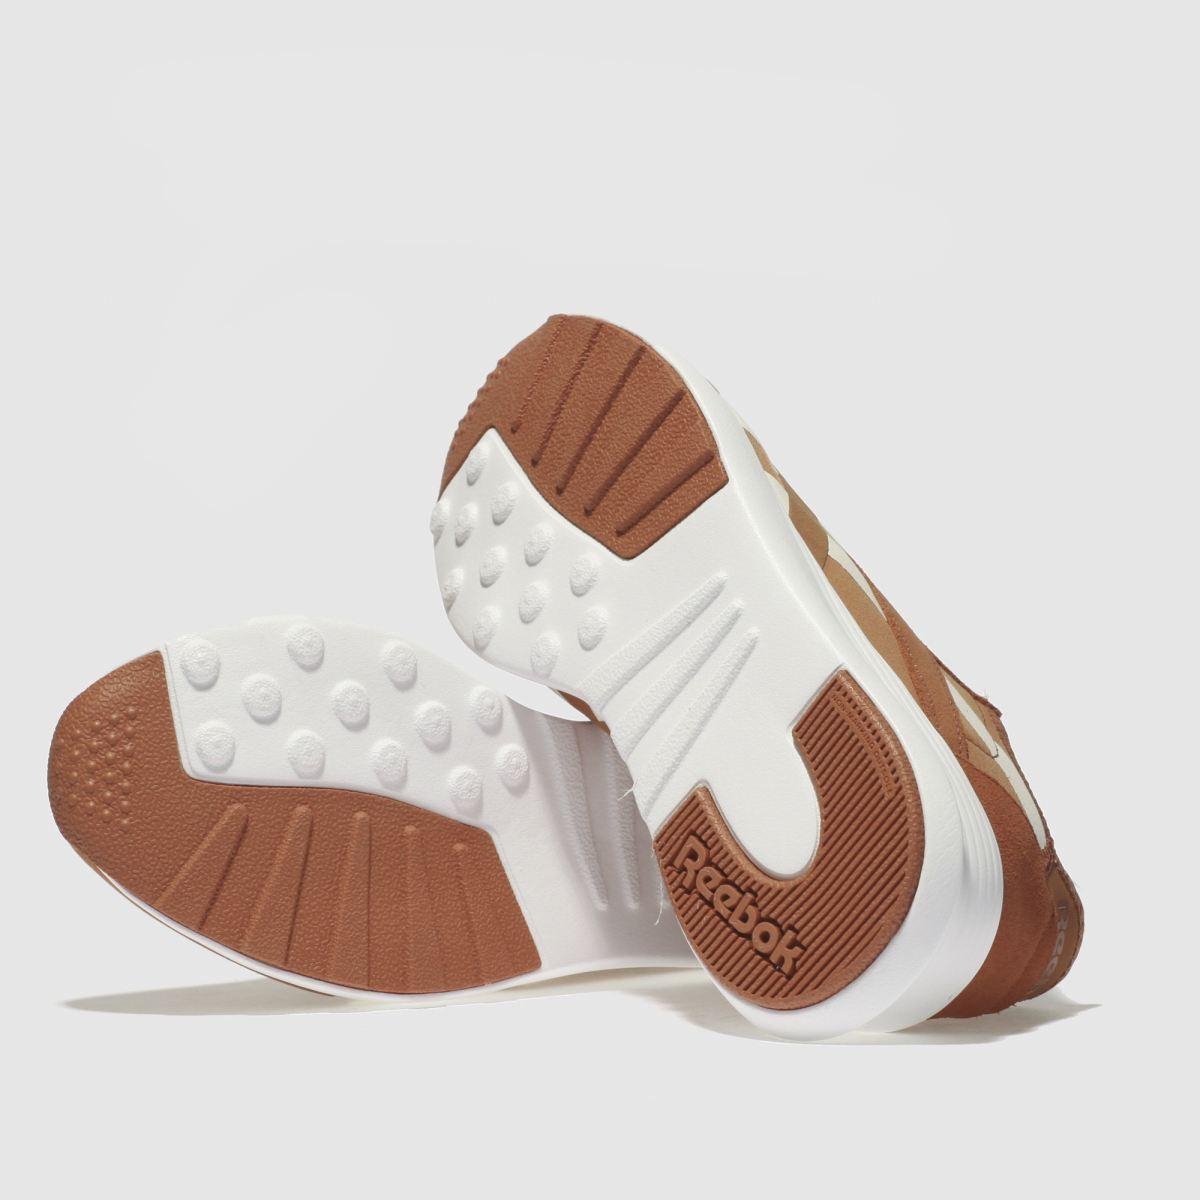 Damen Orange reebok Classic Nylon Sp Sneaker | Schuhe schuh Gute Qualität beliebte Schuhe | 5c6458